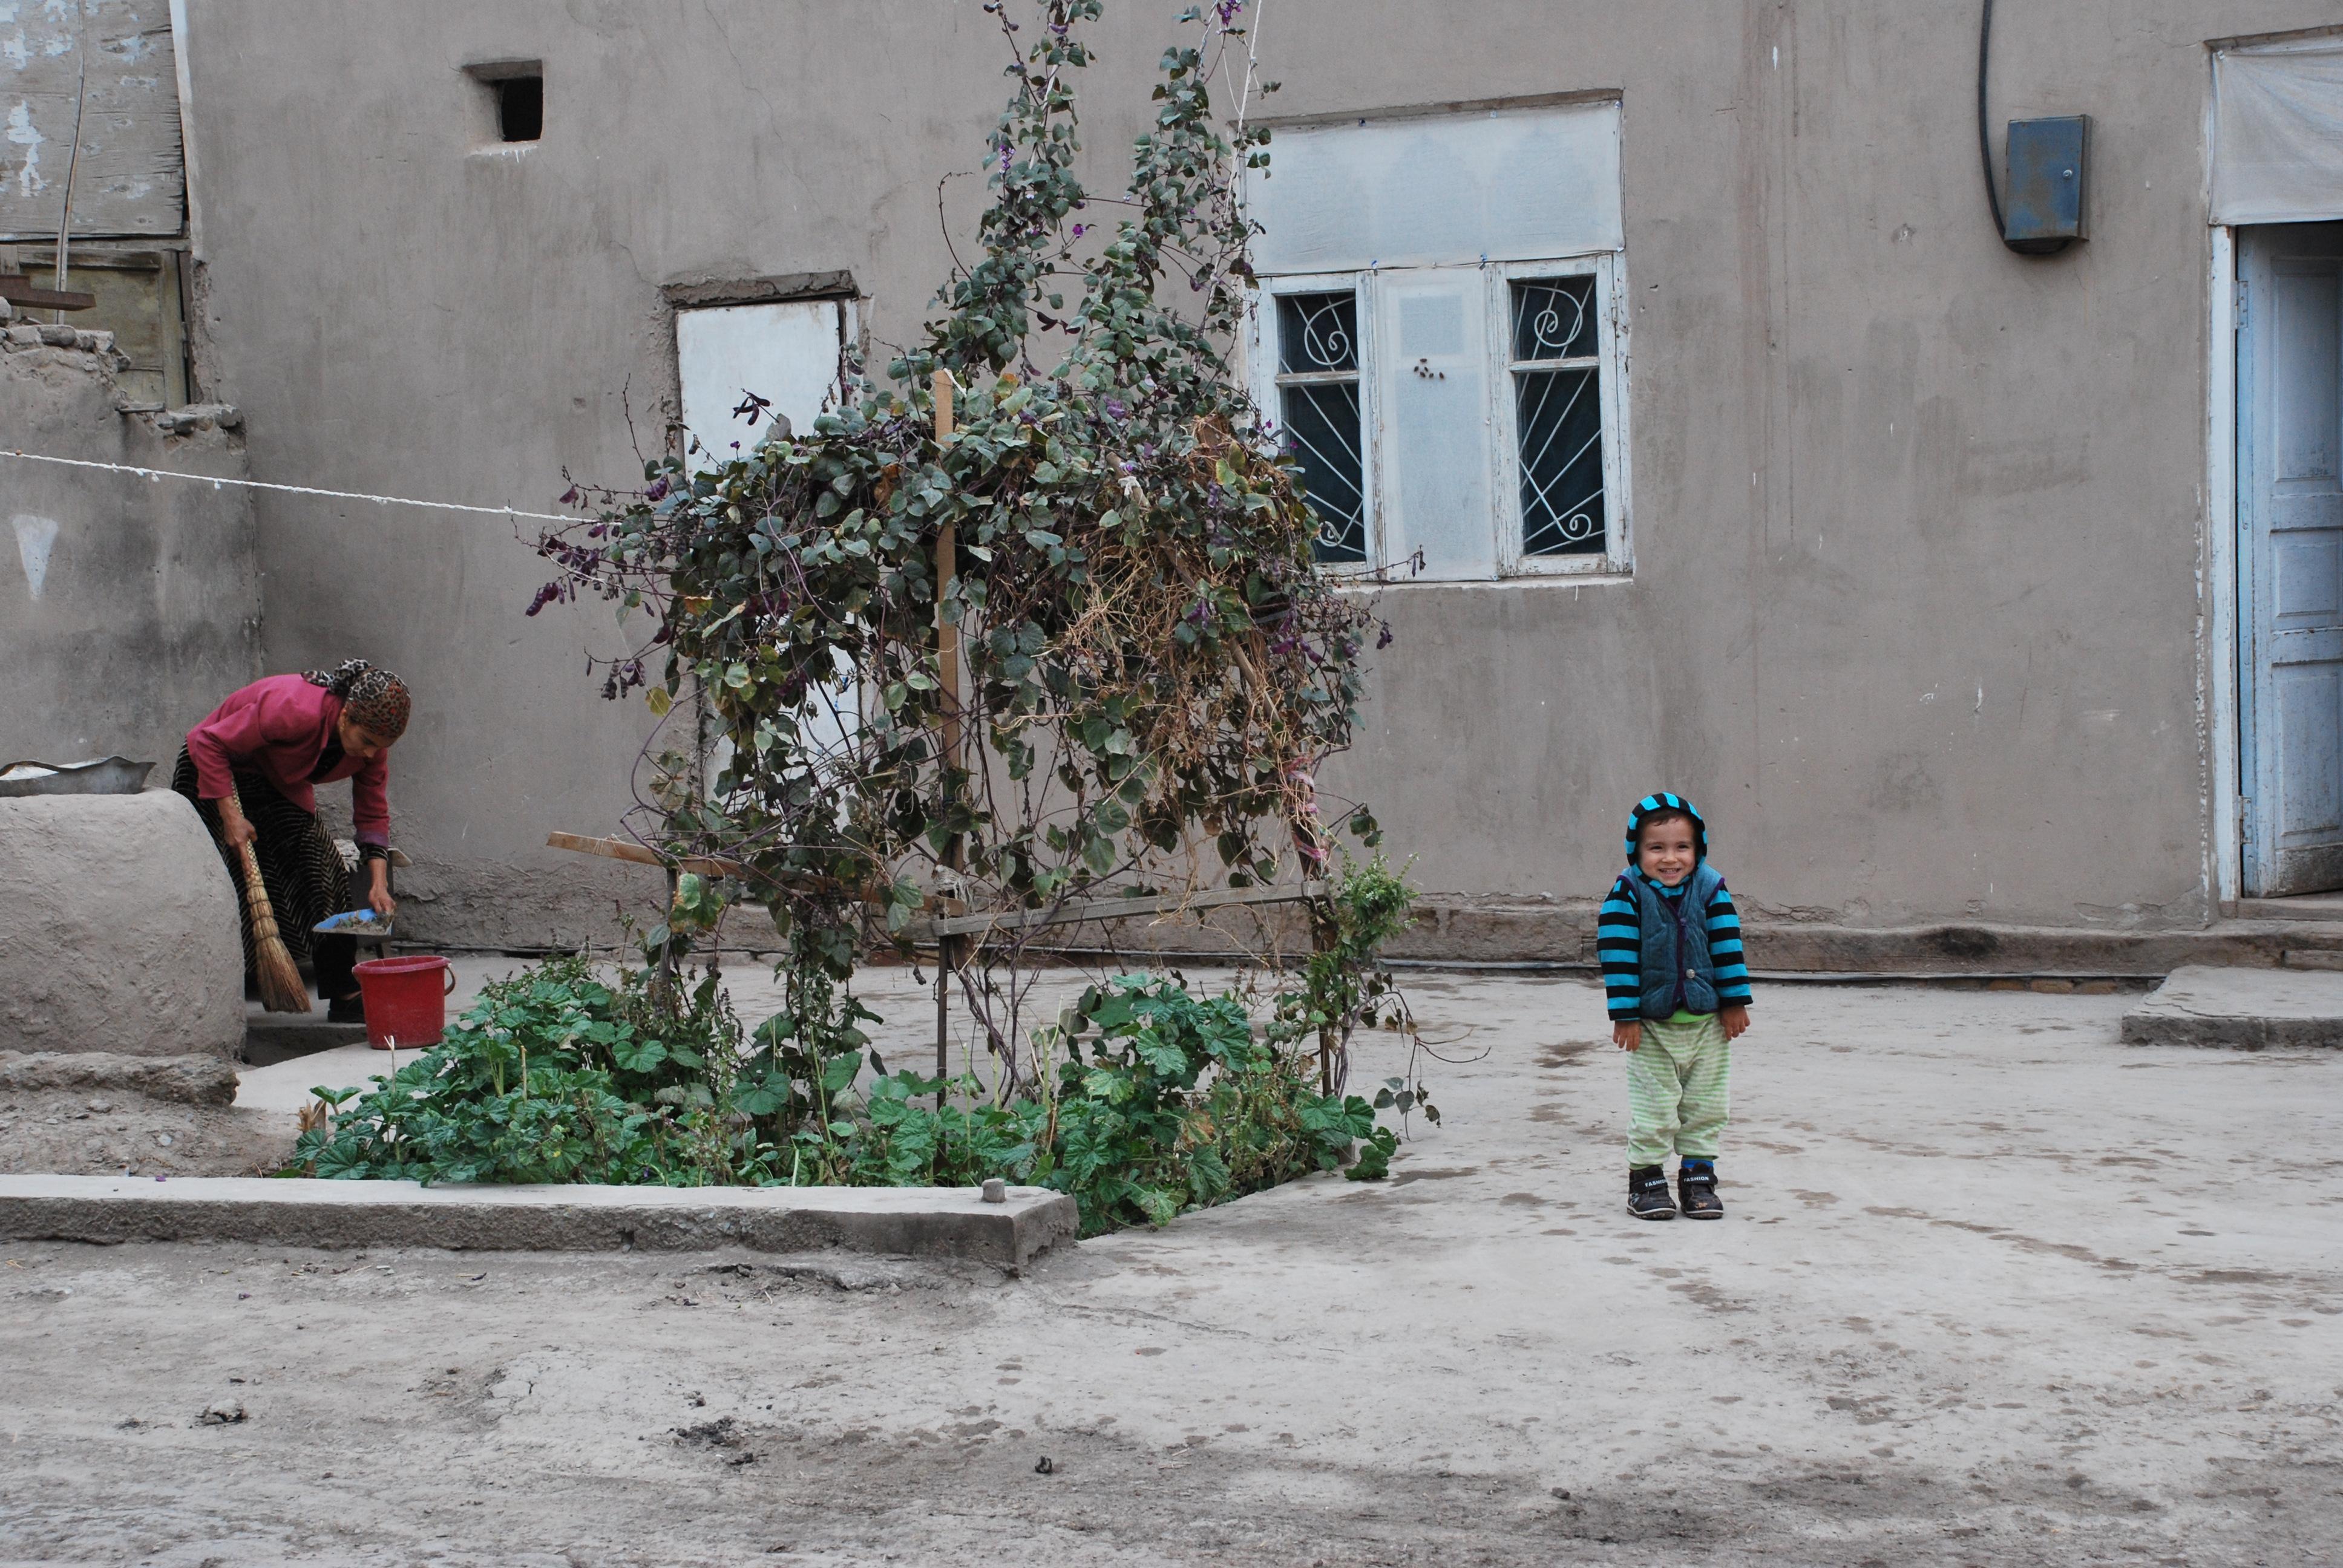 Khiva, Uzbekistan 2015